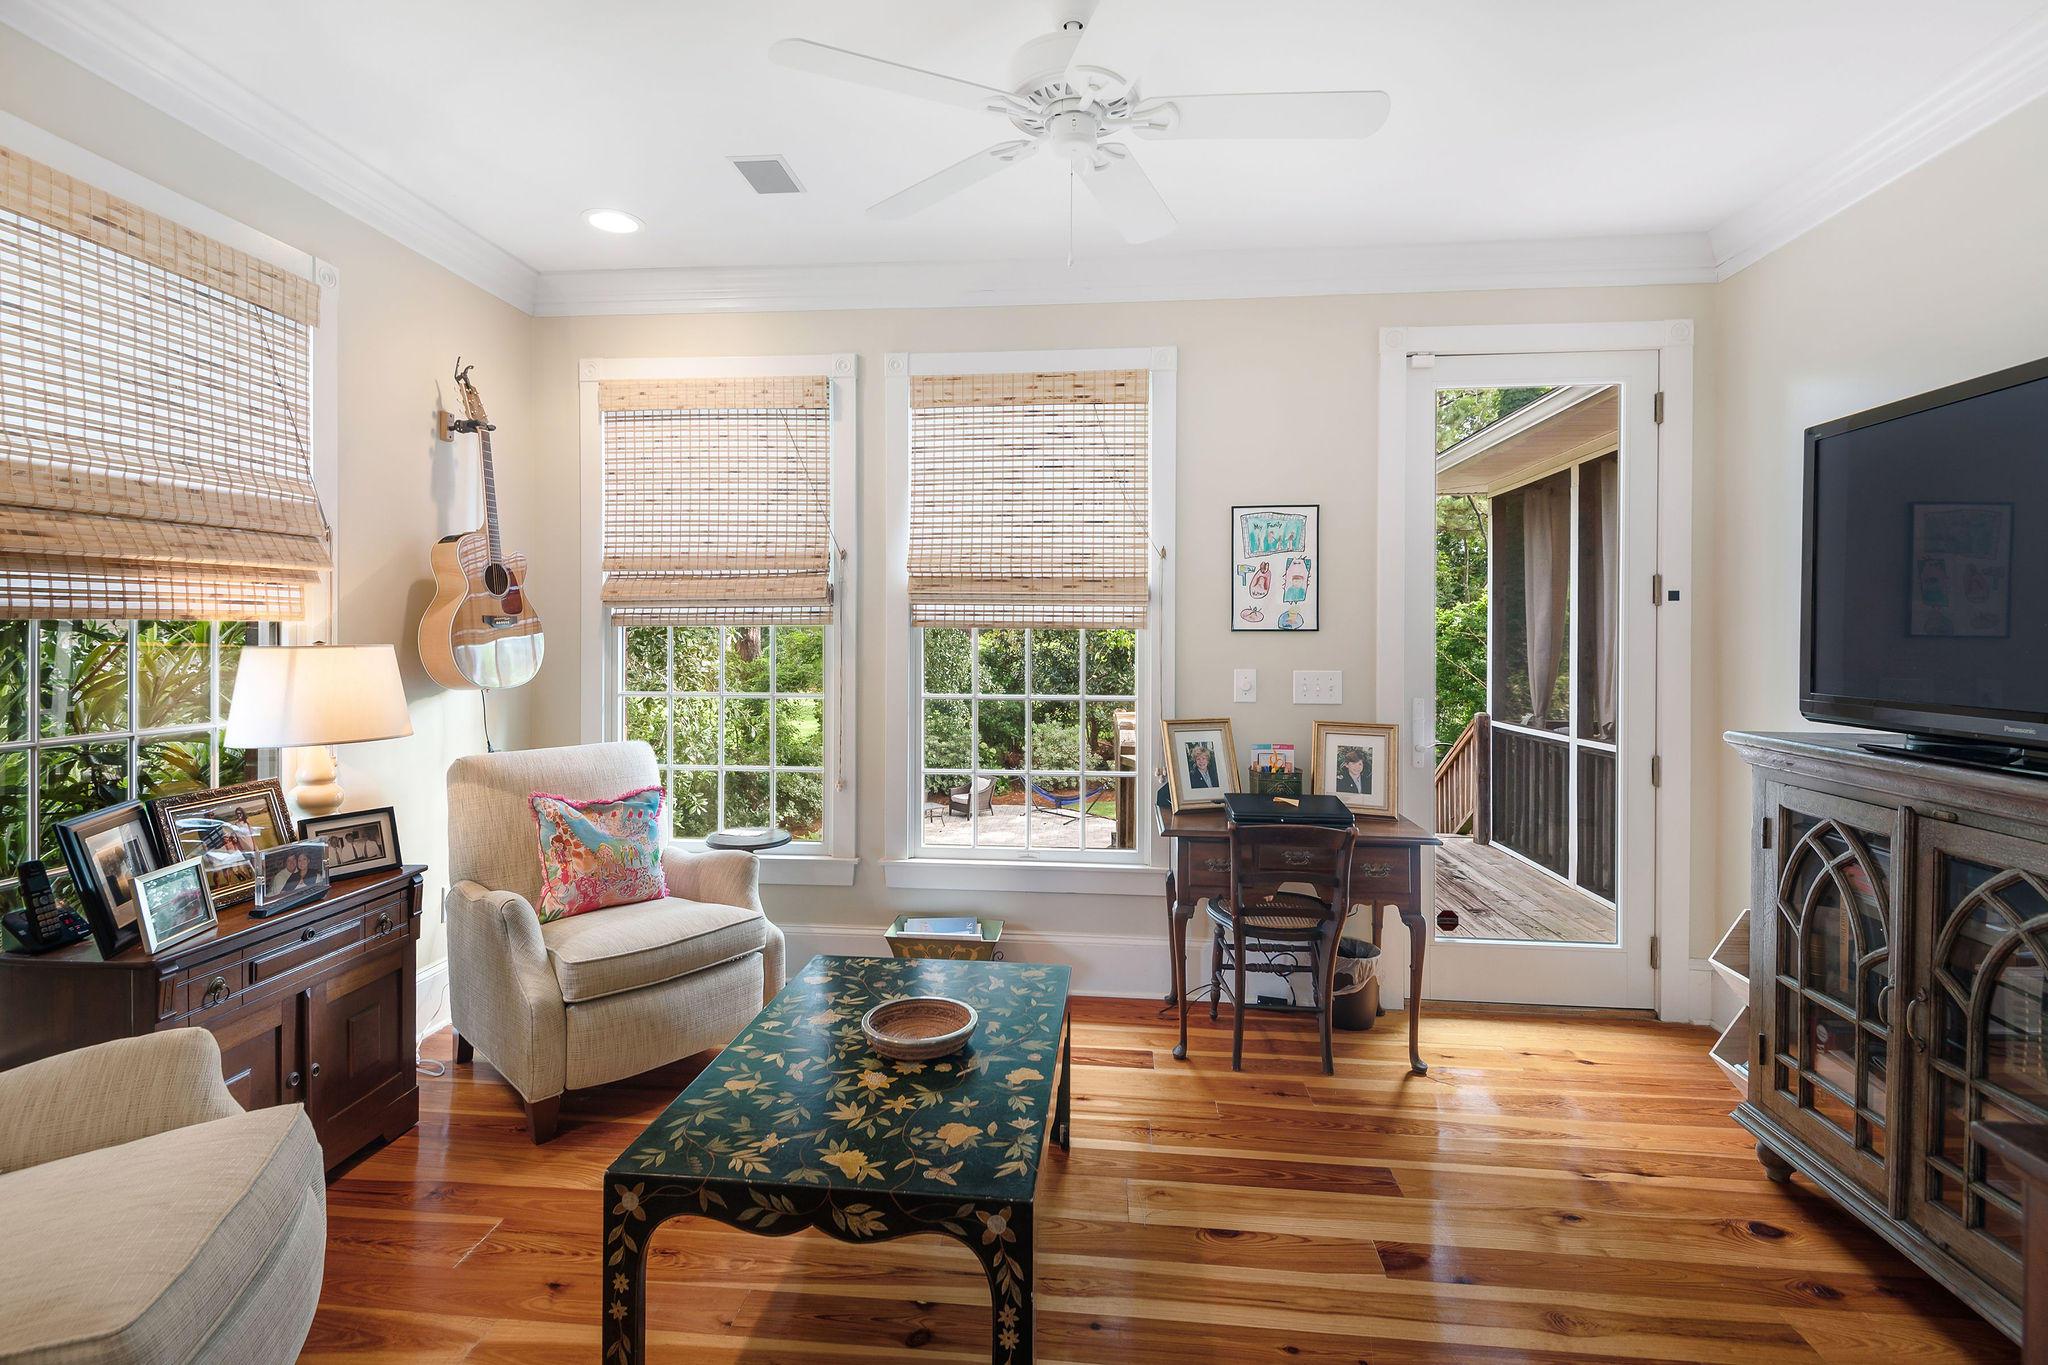 Country Club II Homes For Sale - 1482 Burningtree, Charleston, SC - 39